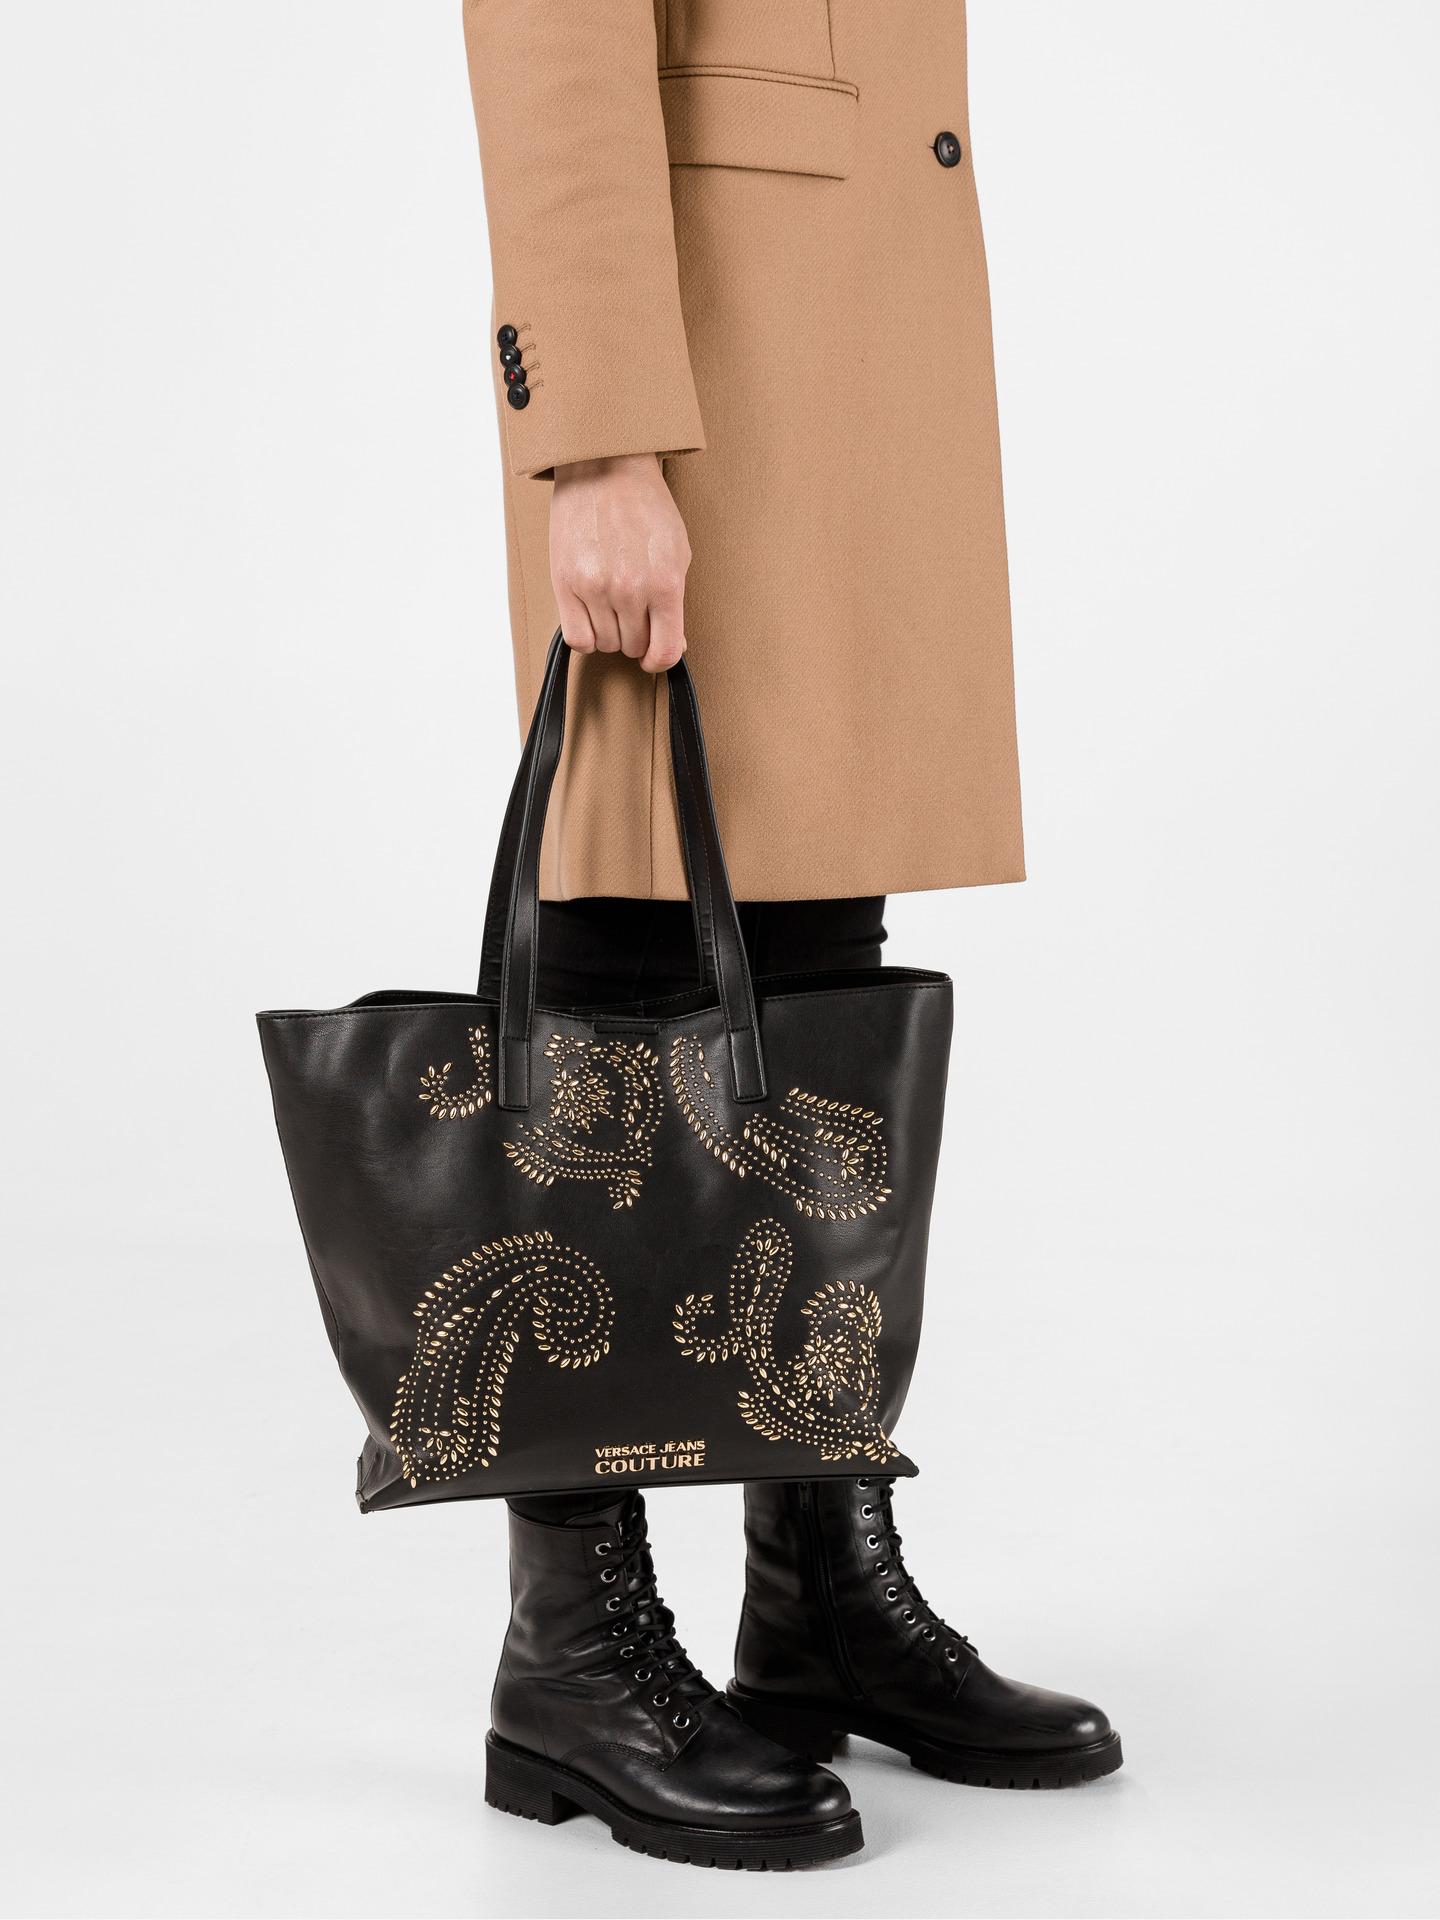 Versace Jeans Couture Torebka Czarny